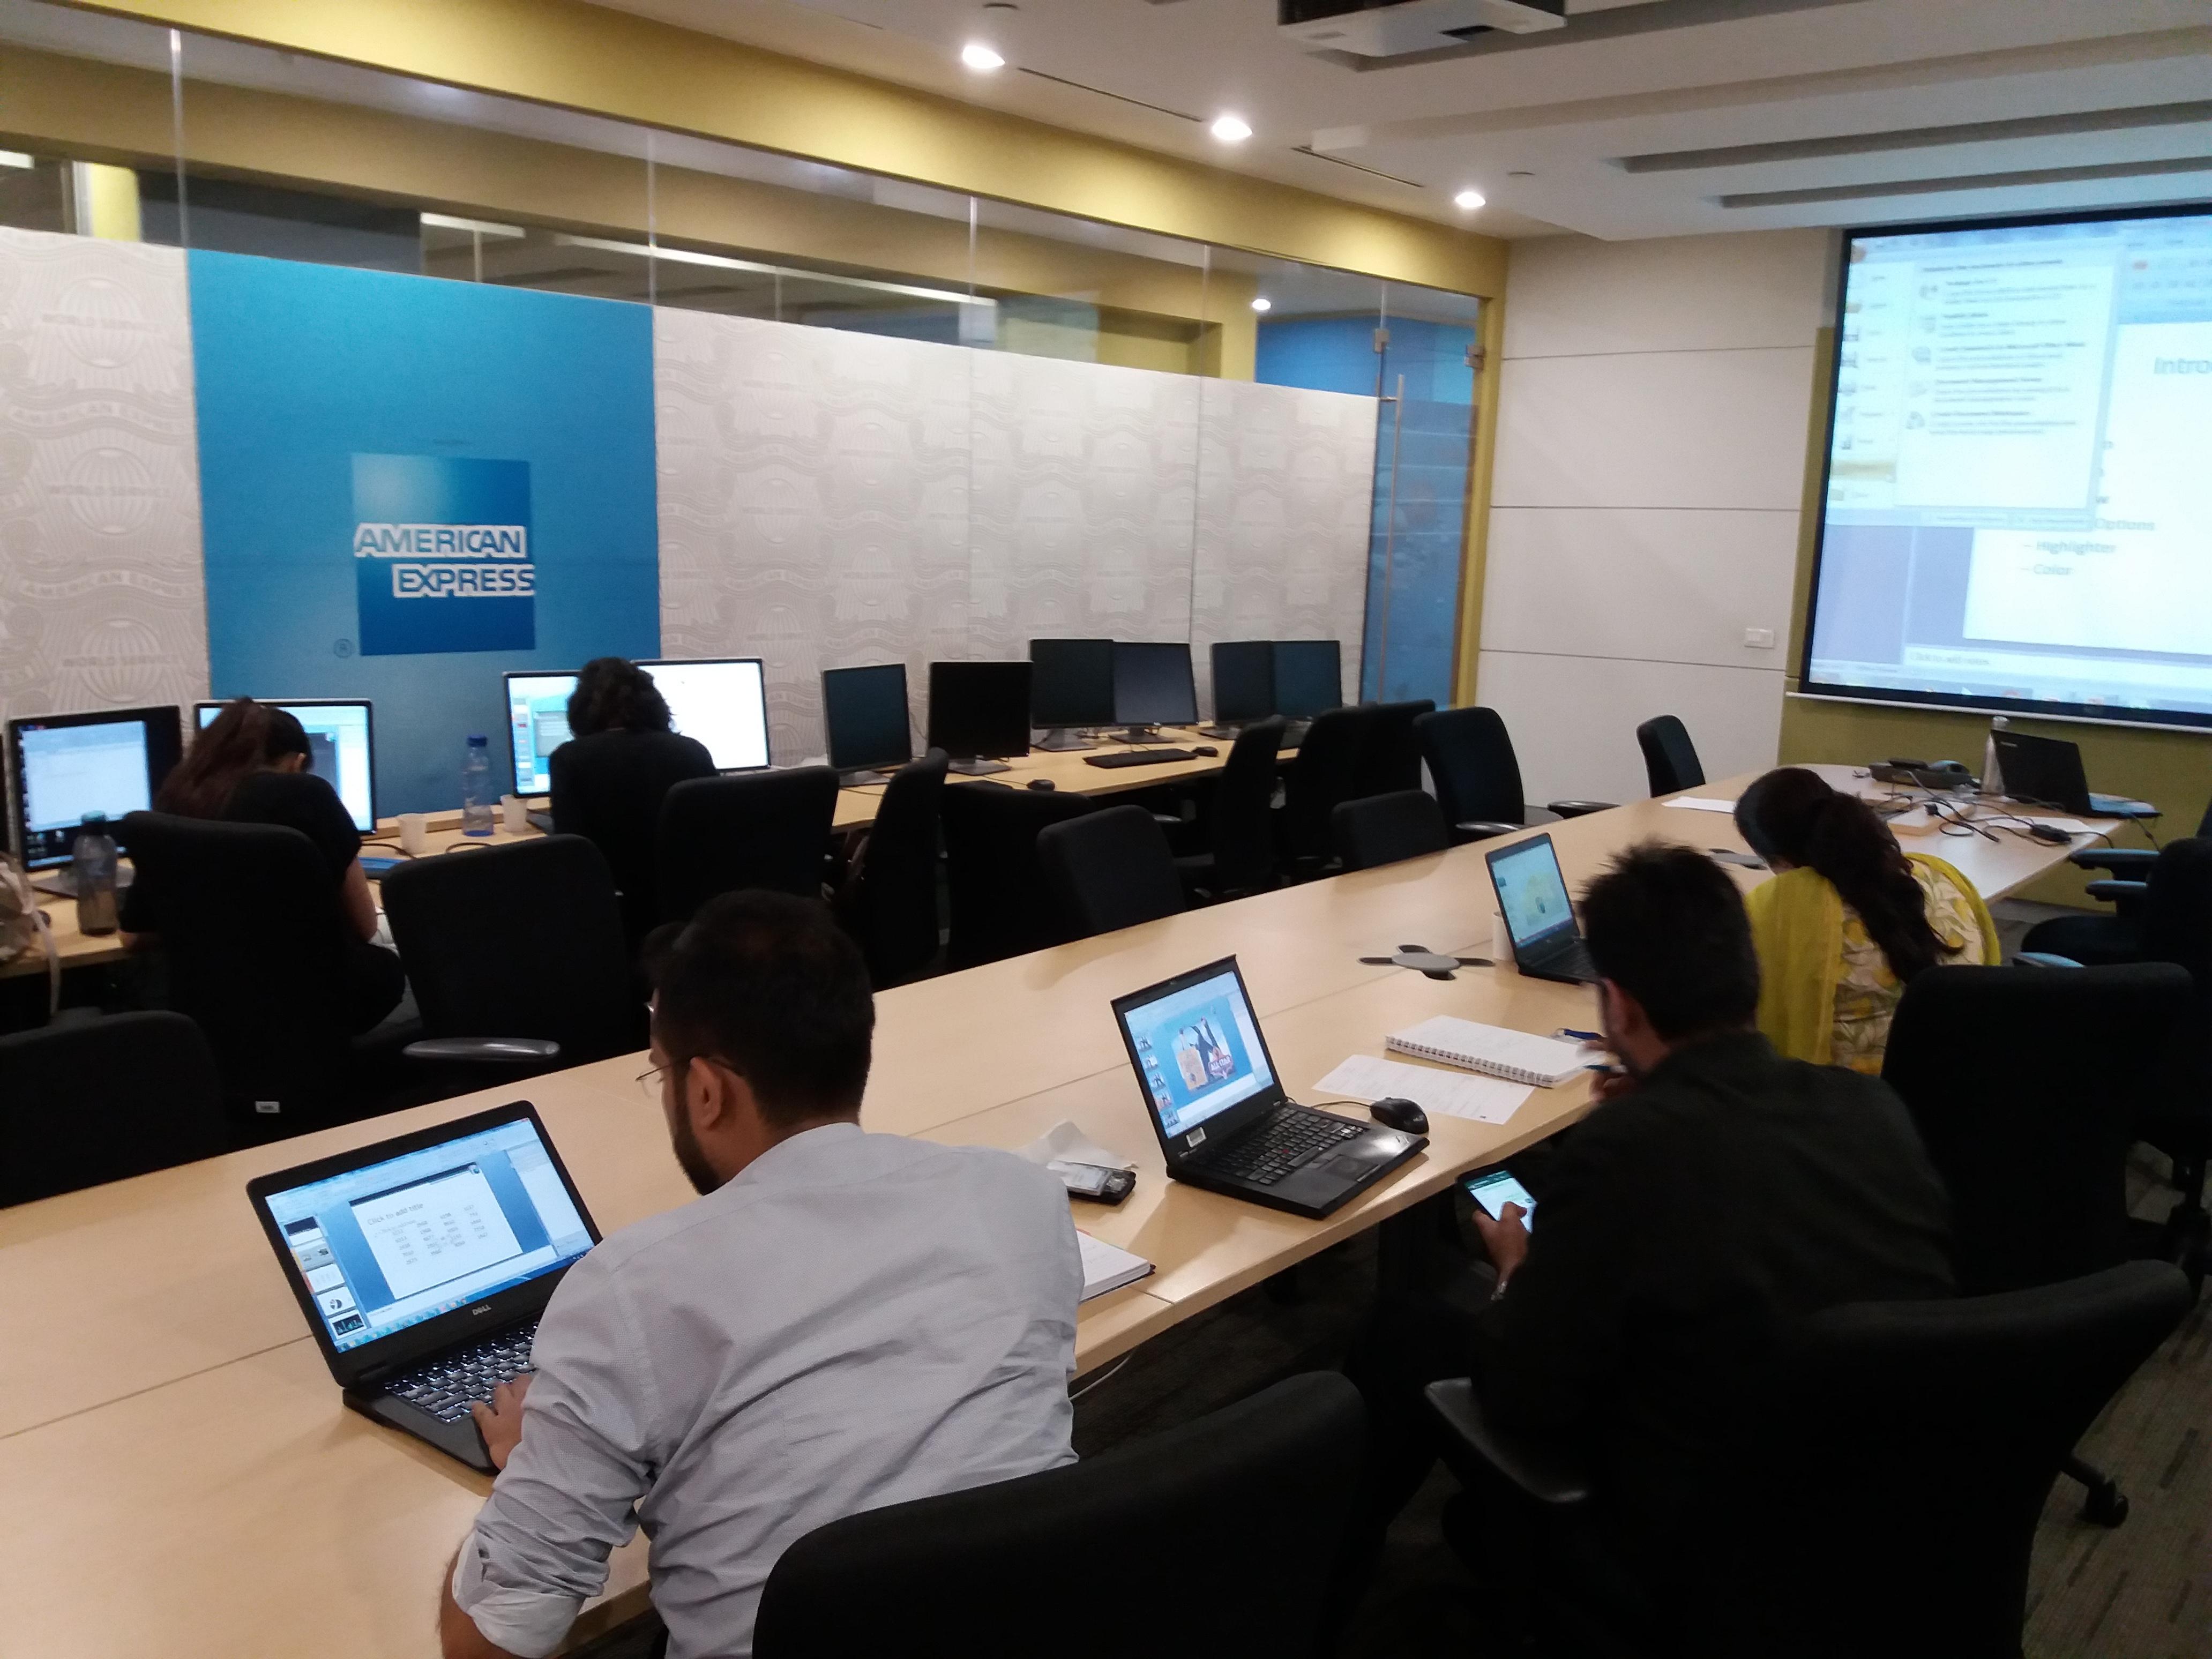 American Express 24-Aug-2016 (Gurgaon) - Nurture Tech Academy